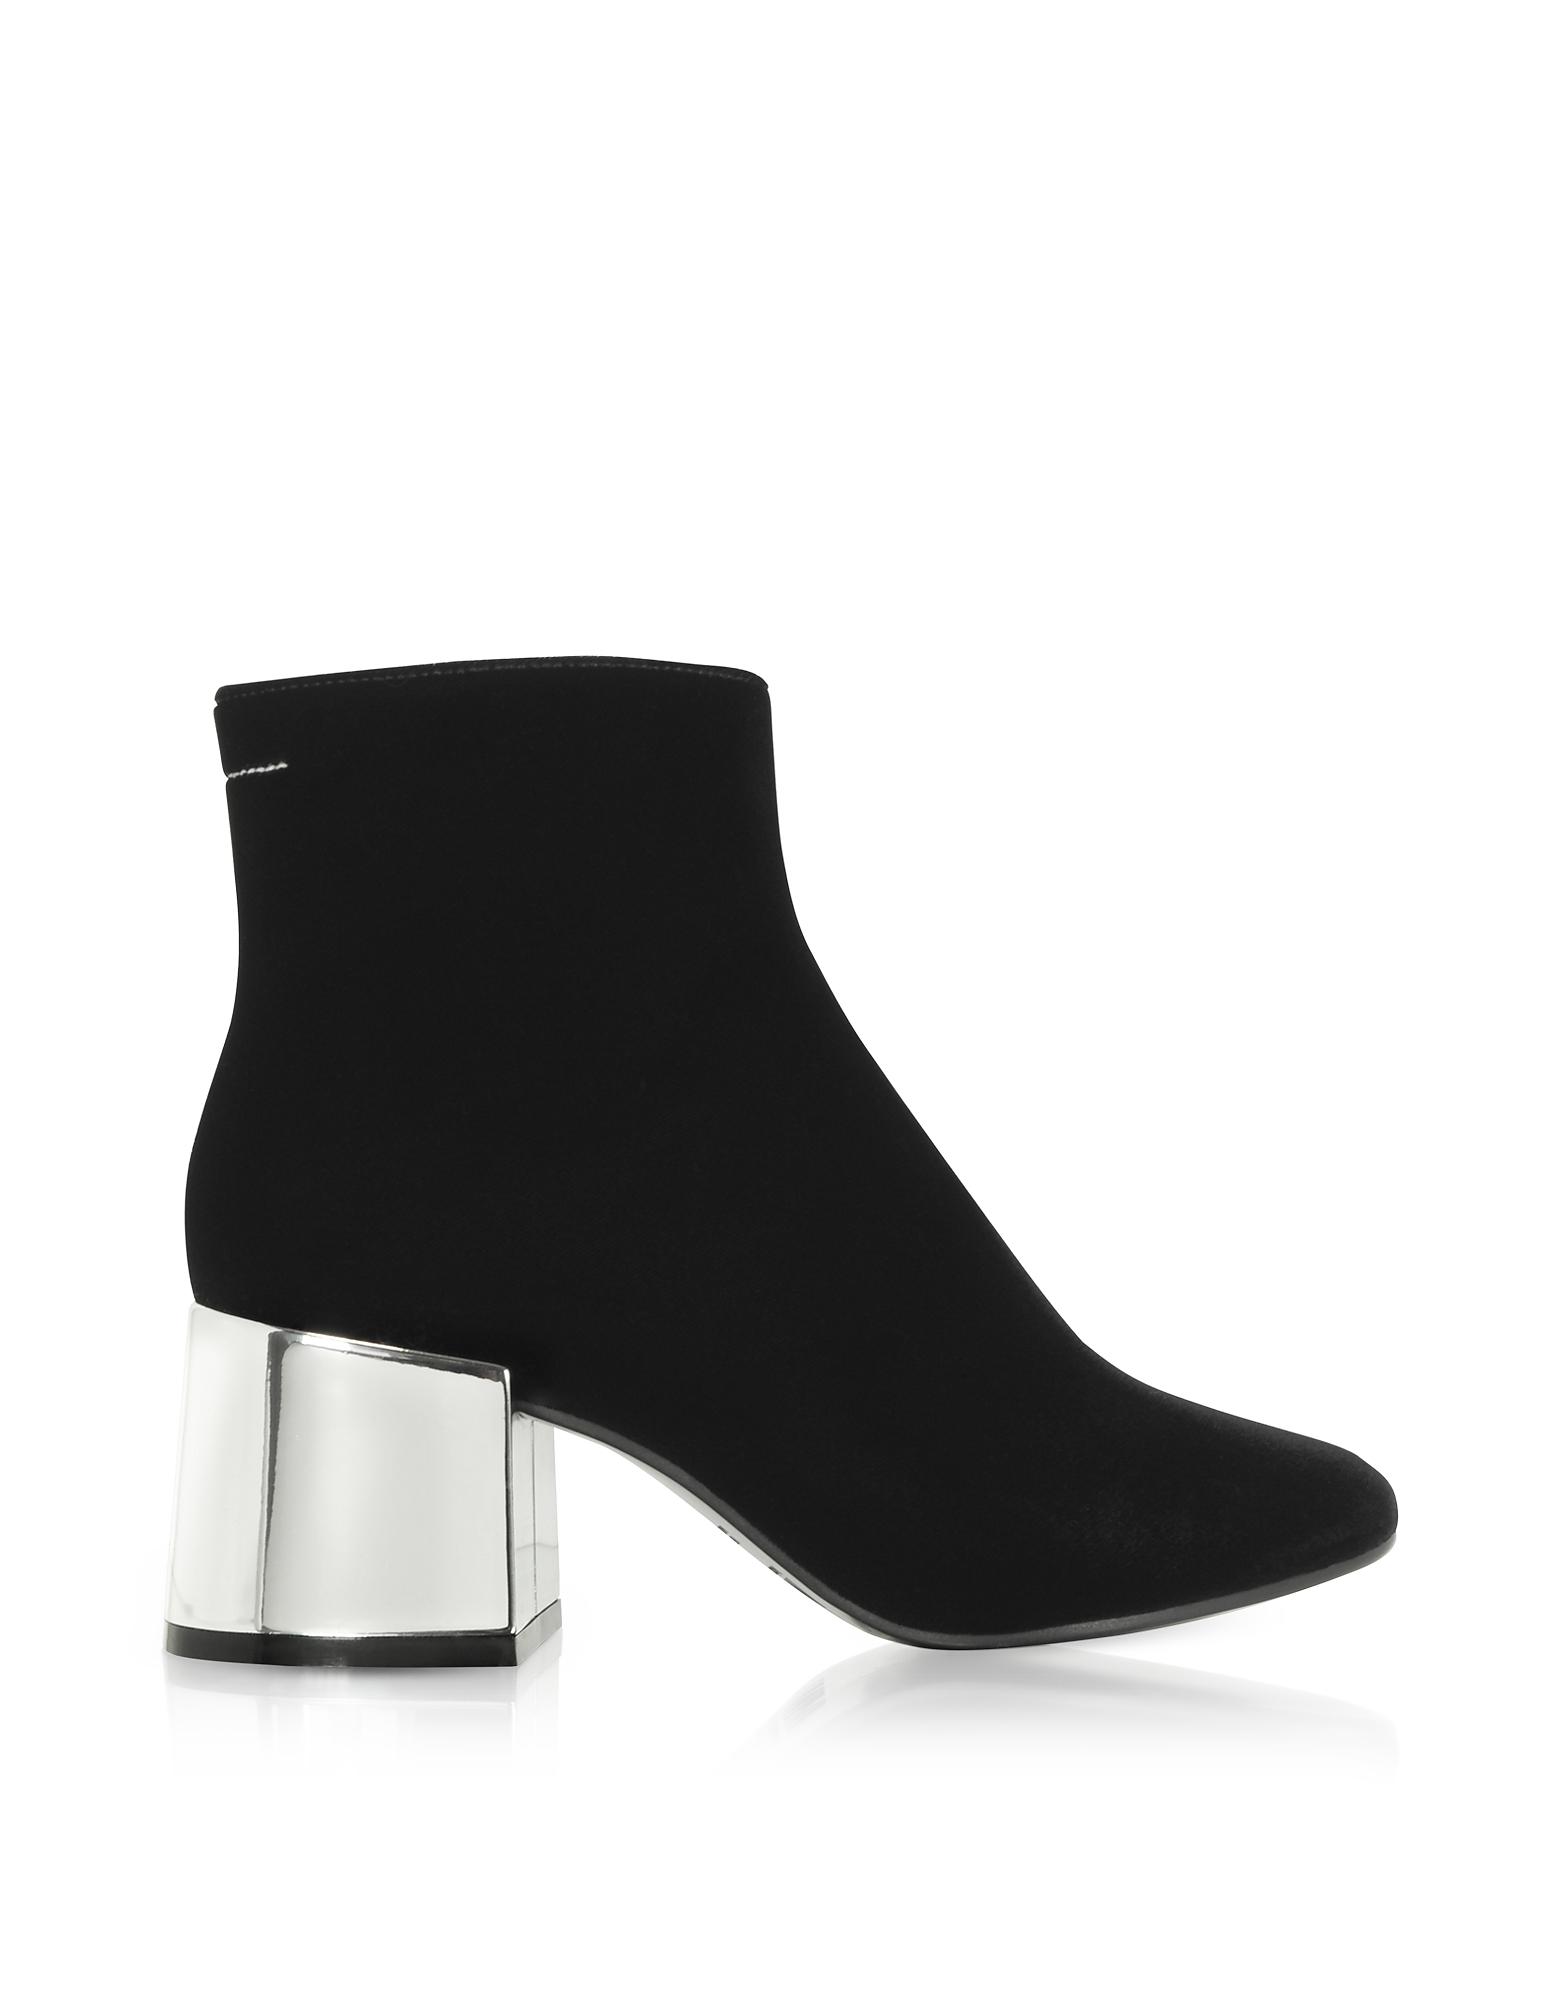 MM6 Maison Martin Margiela Shoes, Black Velvet Boots w/Mirror Heels